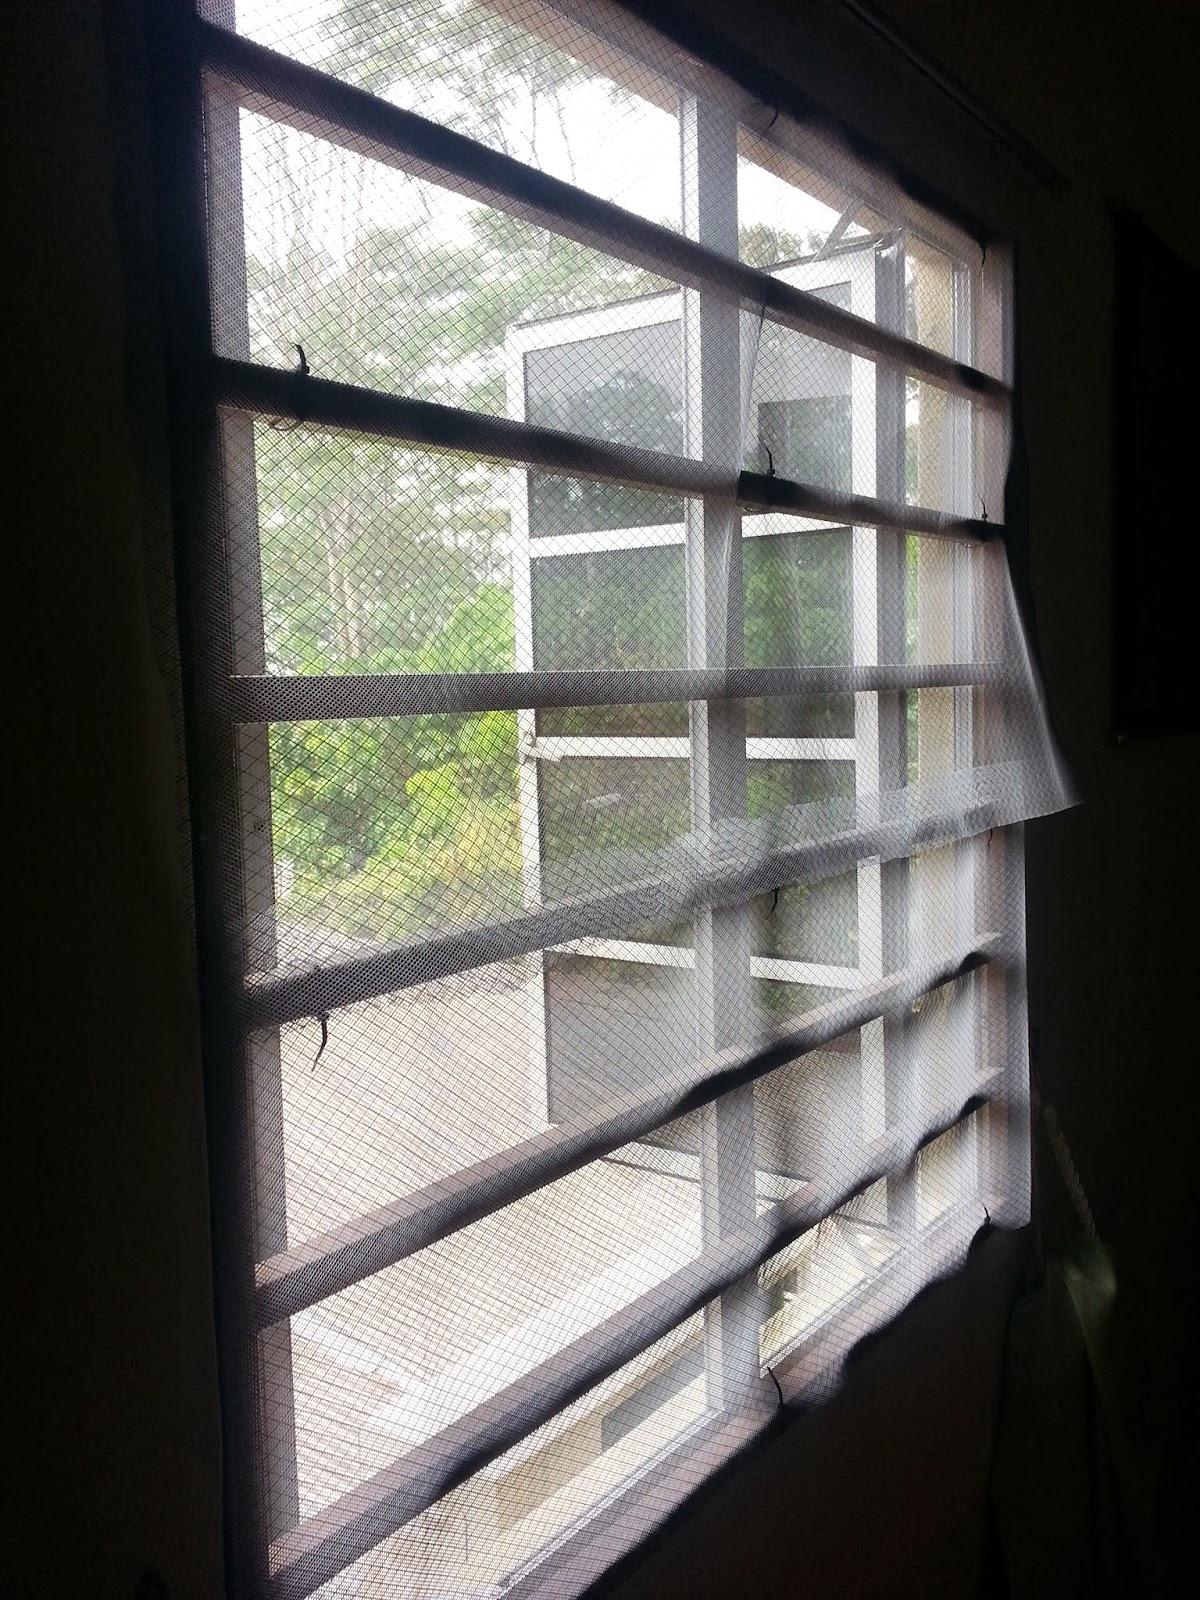 Ada ruang untuk buka-tutup tingkap